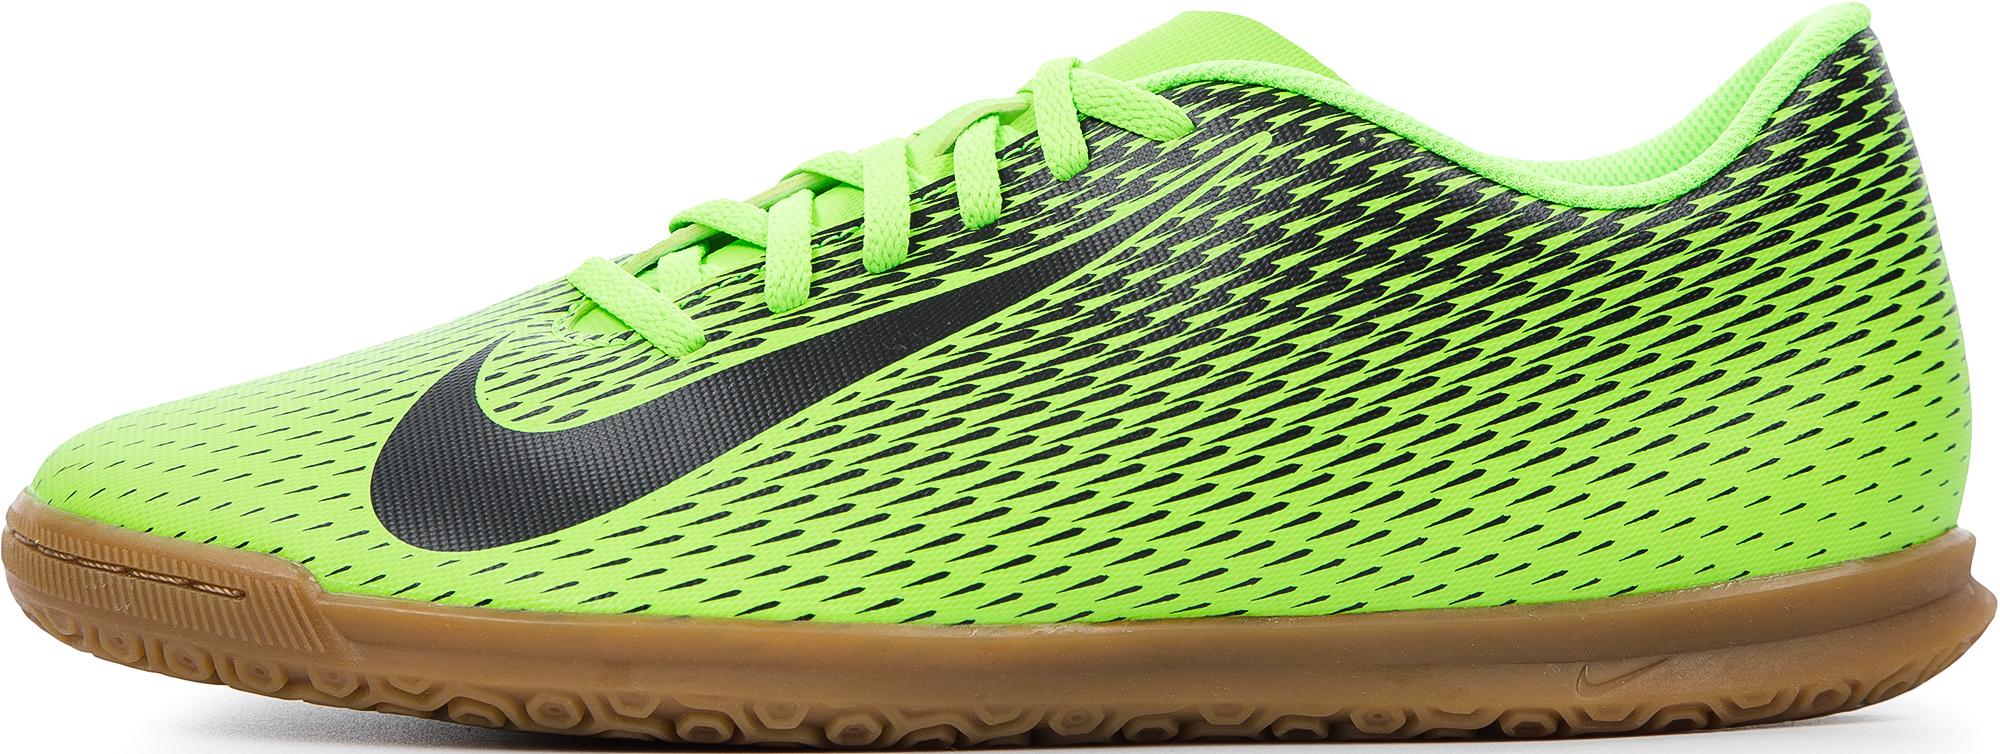 Nike Бутсы мужские Bravata Ii Ic, размер 46,5